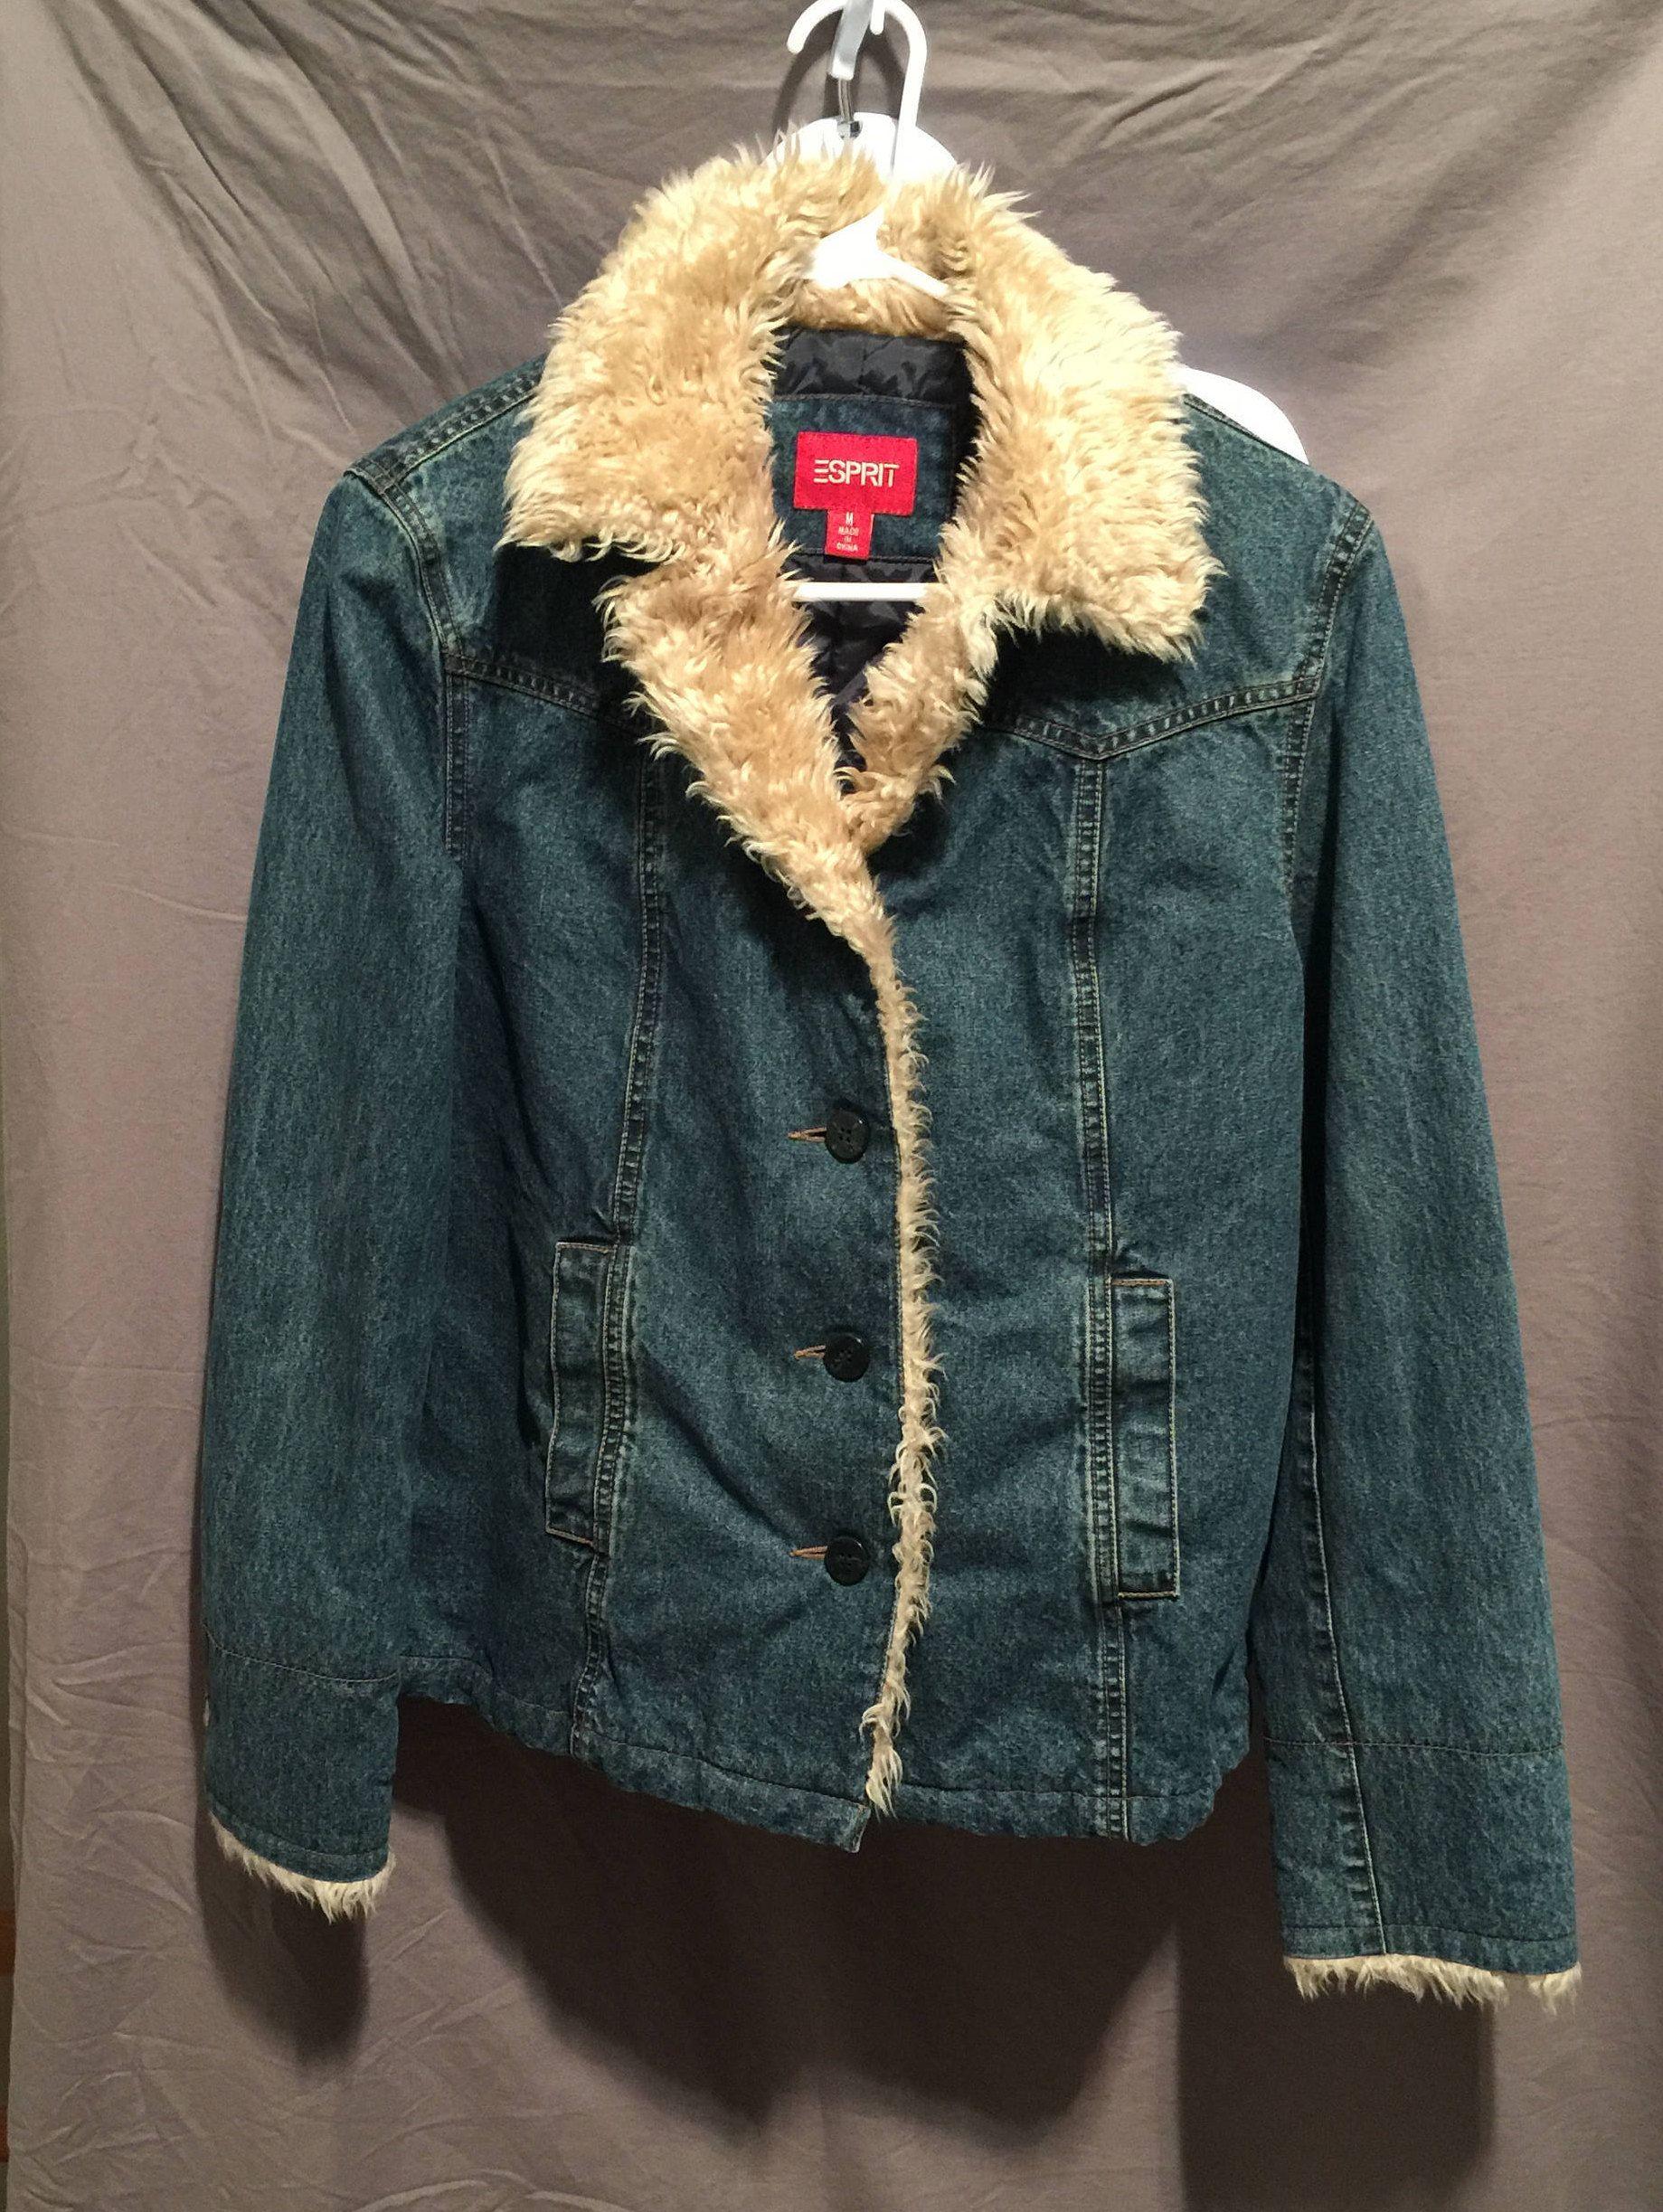 Vintage Clothing Woman S Jacket Denim Jacket 90s Etsy Vintage Clothes Women Vintage Outfits Jackets For Women [ 2446 x 1839 Pixel ]